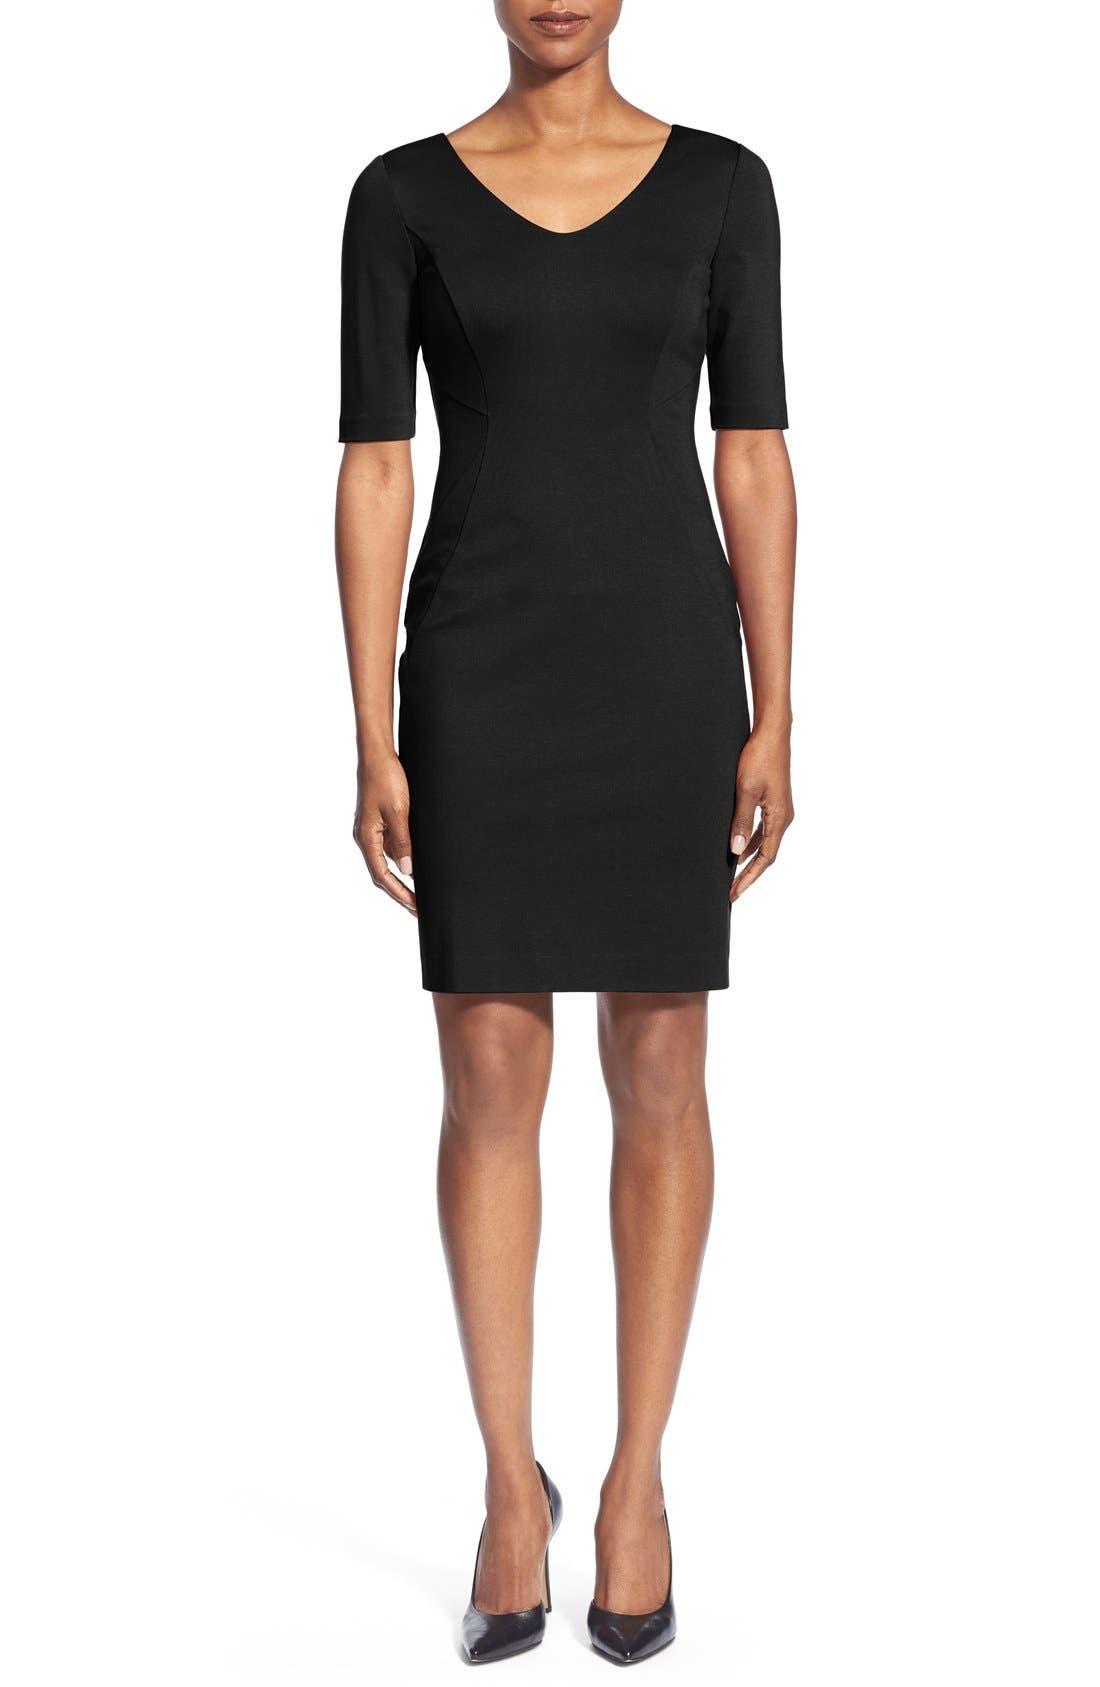 Alternate Image 1 Selected - Halogen® Ponte Dress (Regular & Petite)